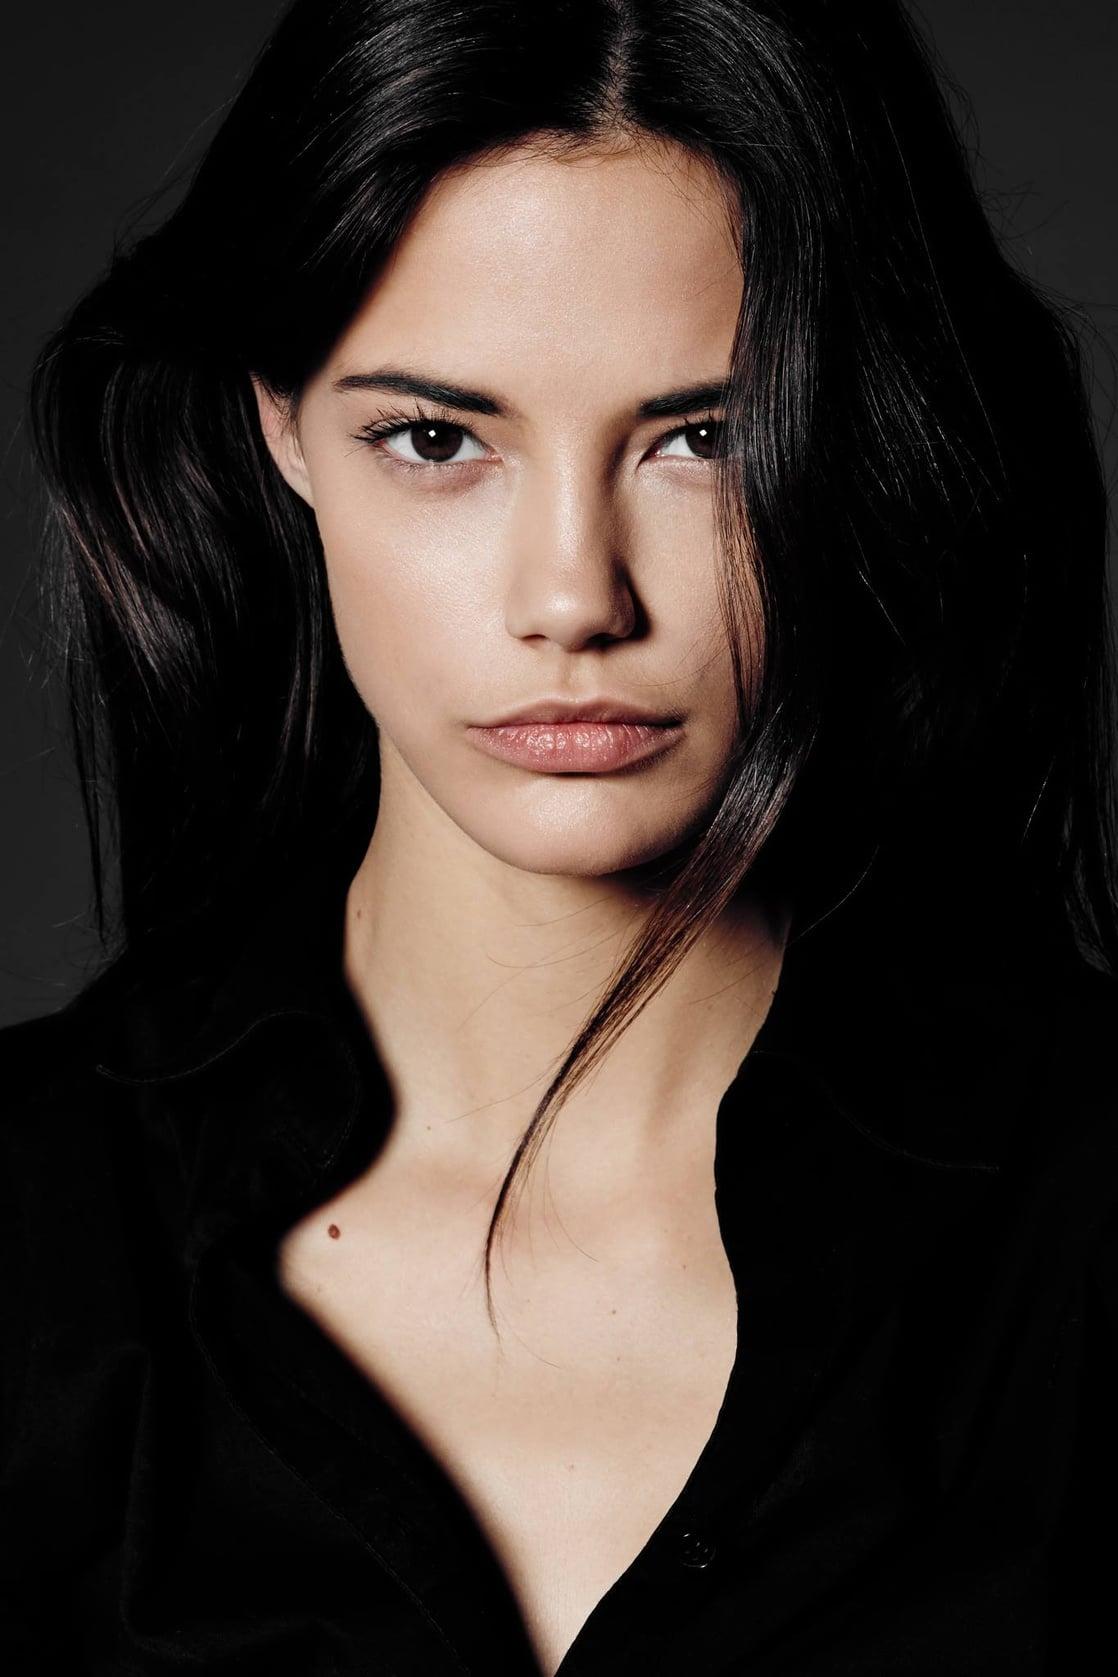 Molly McMichael,Raica Oliveira BRA Hot photo Josie Totah,Talita von Furstenberg